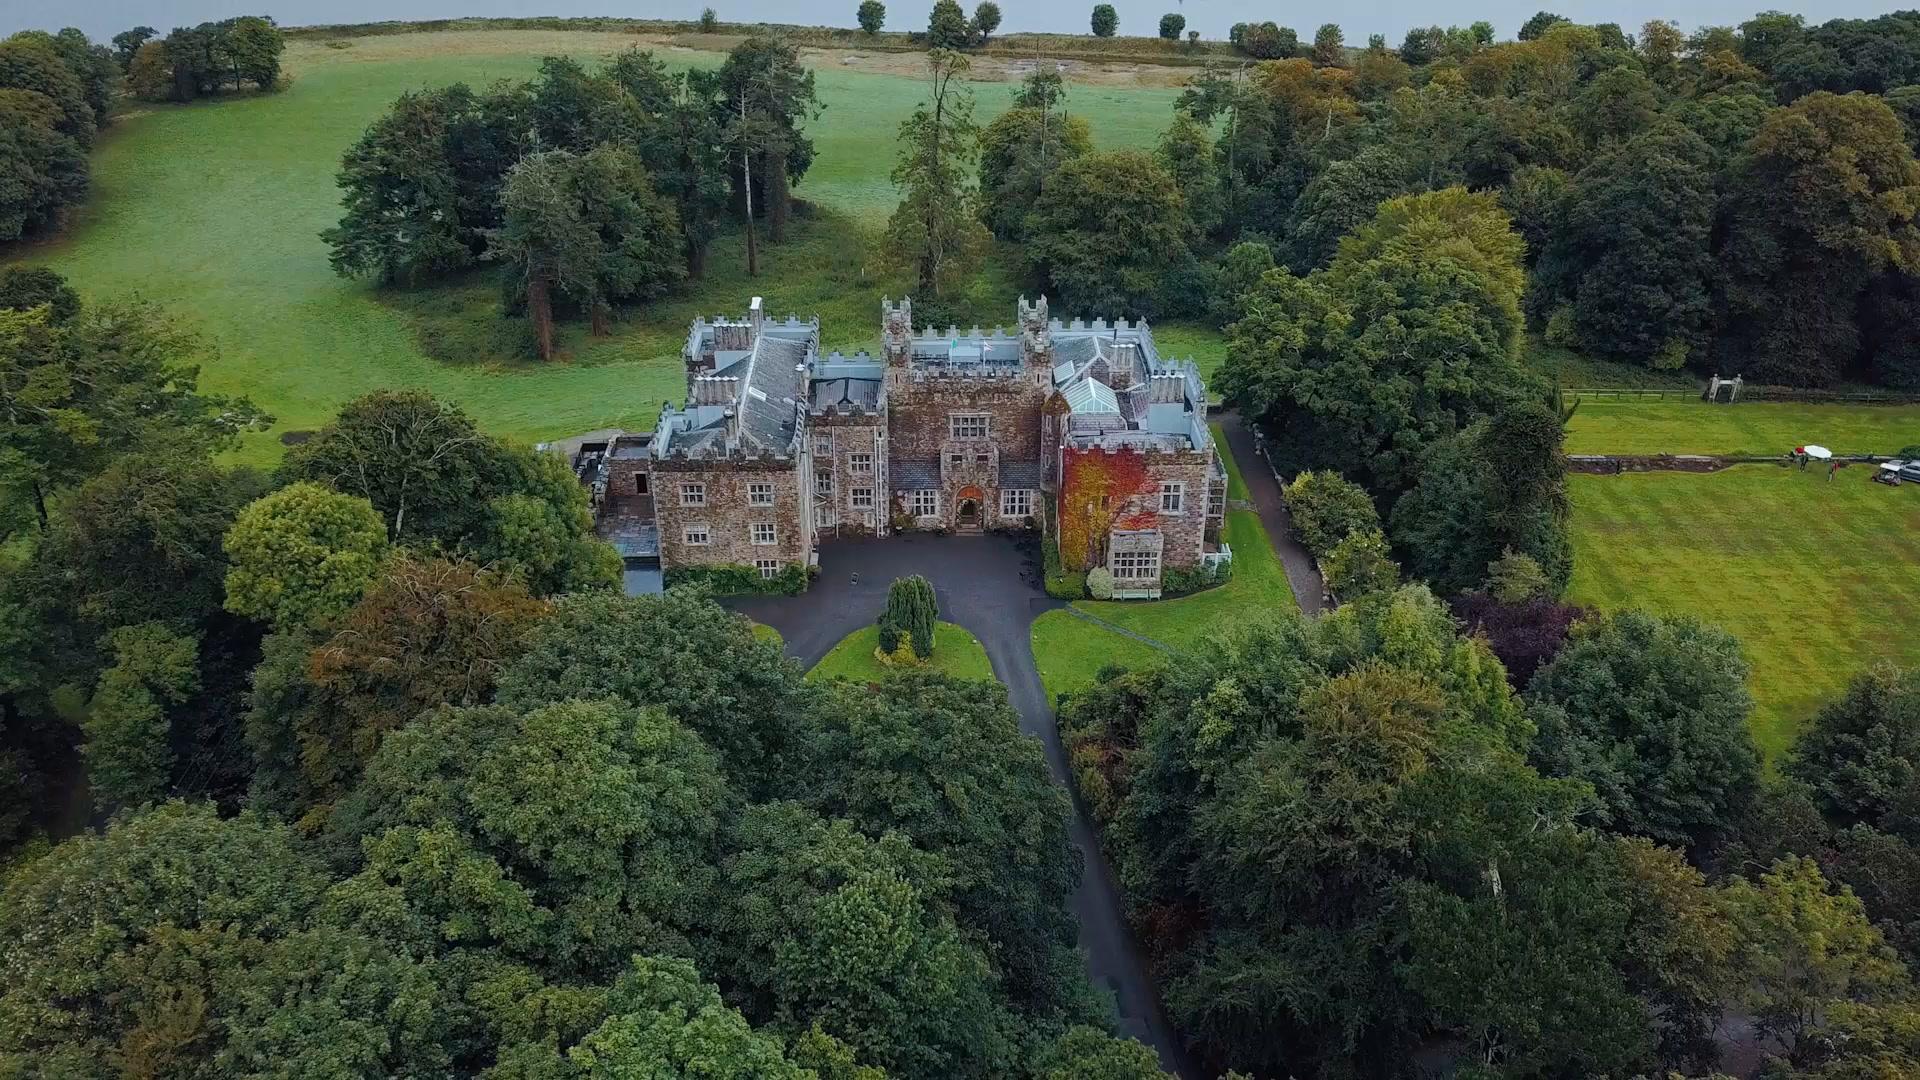 Jo + Rowland | Waterford, Ireland | waterford castle hotel